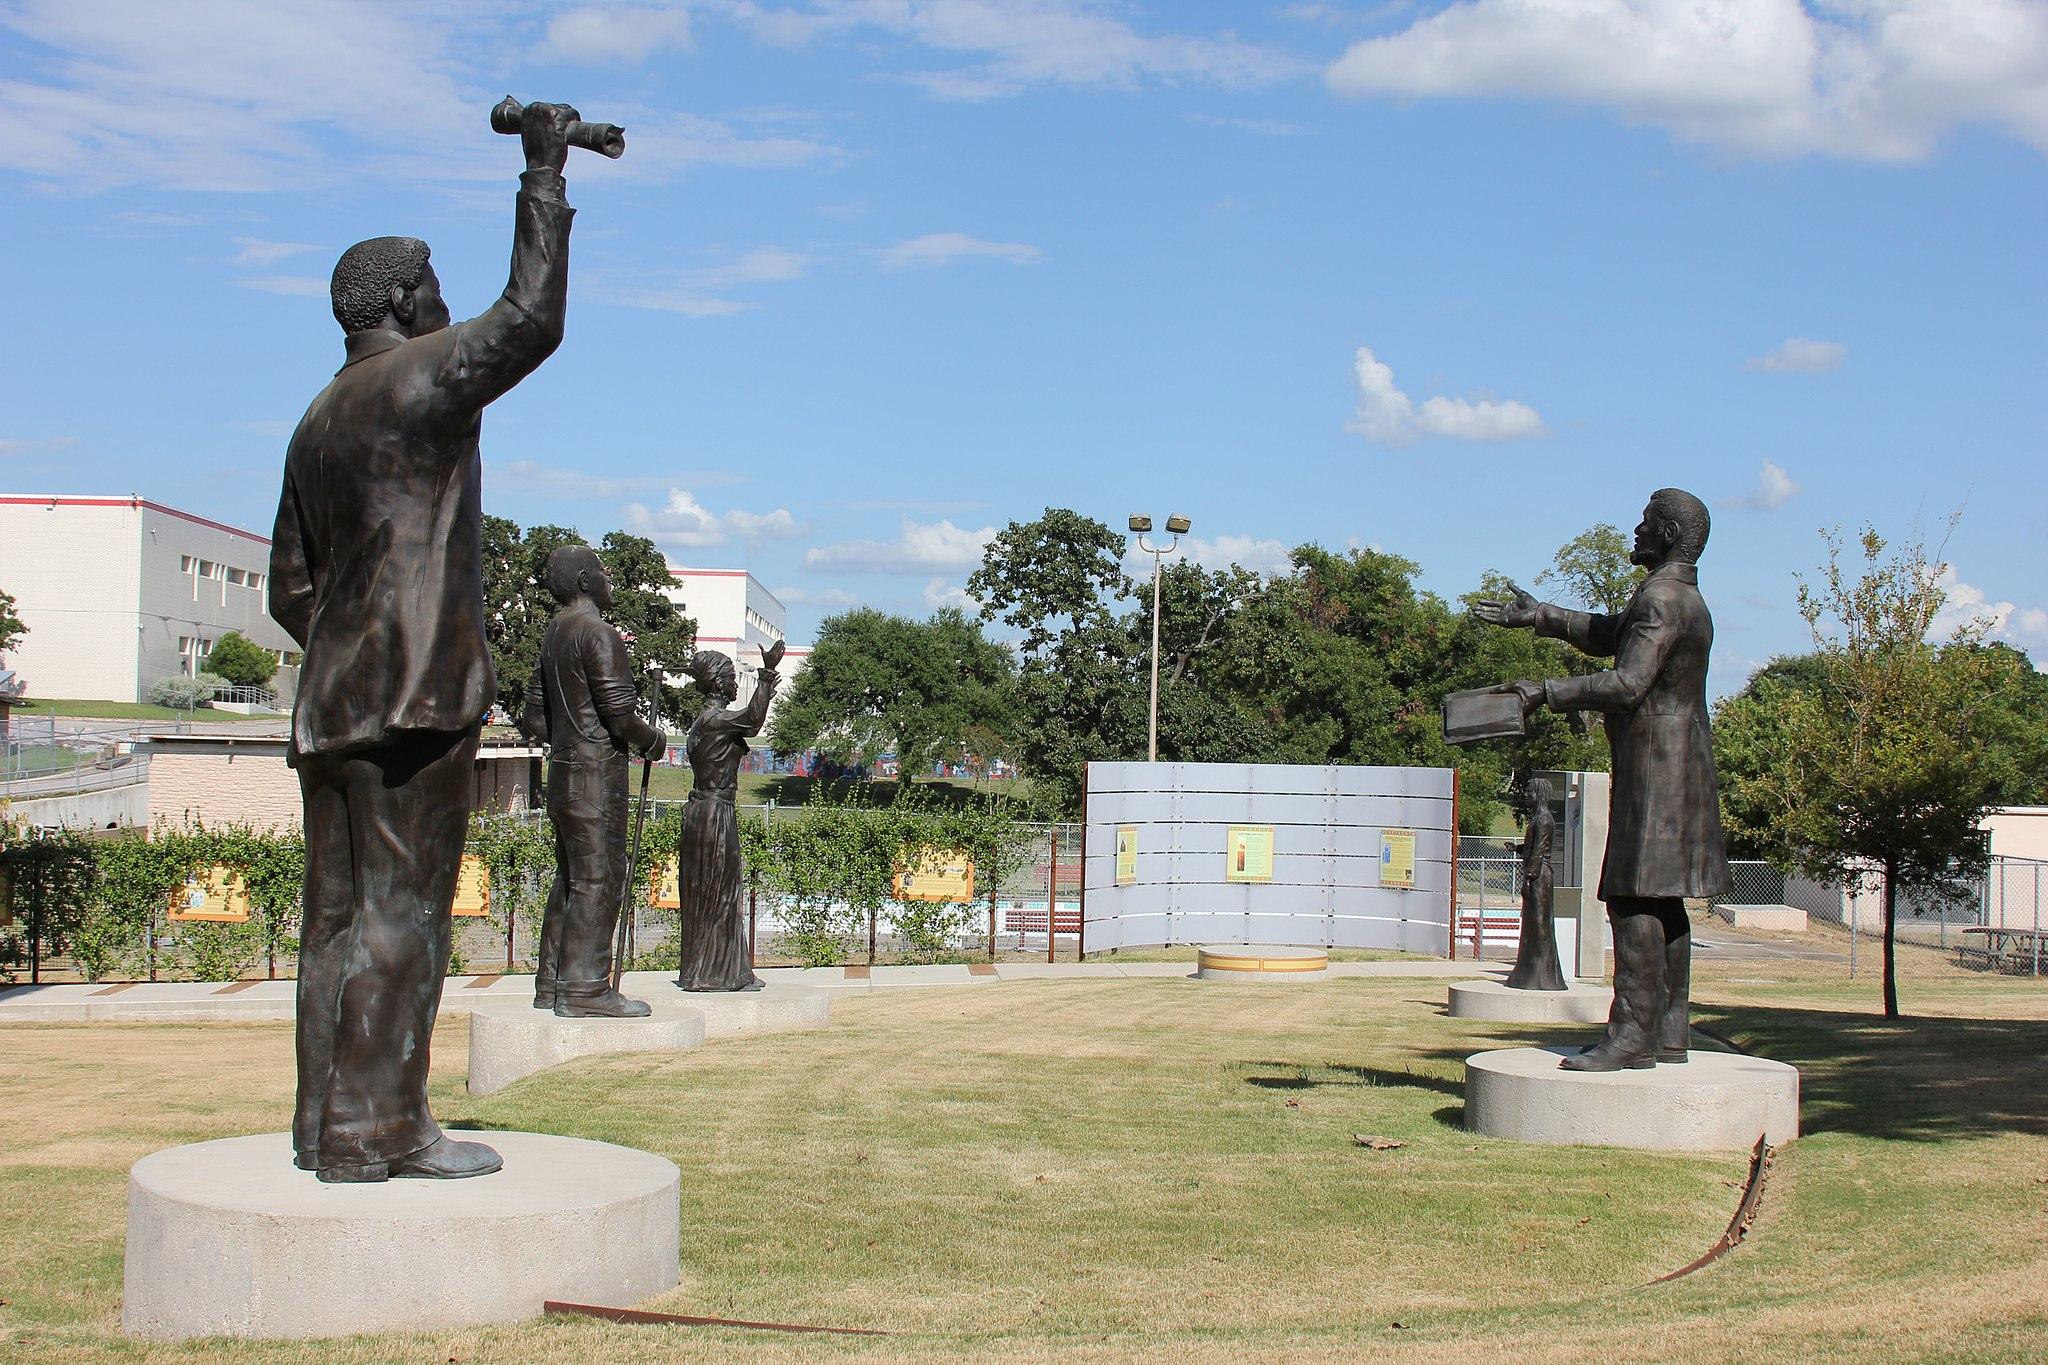 Statues in circular arrangement sharing news